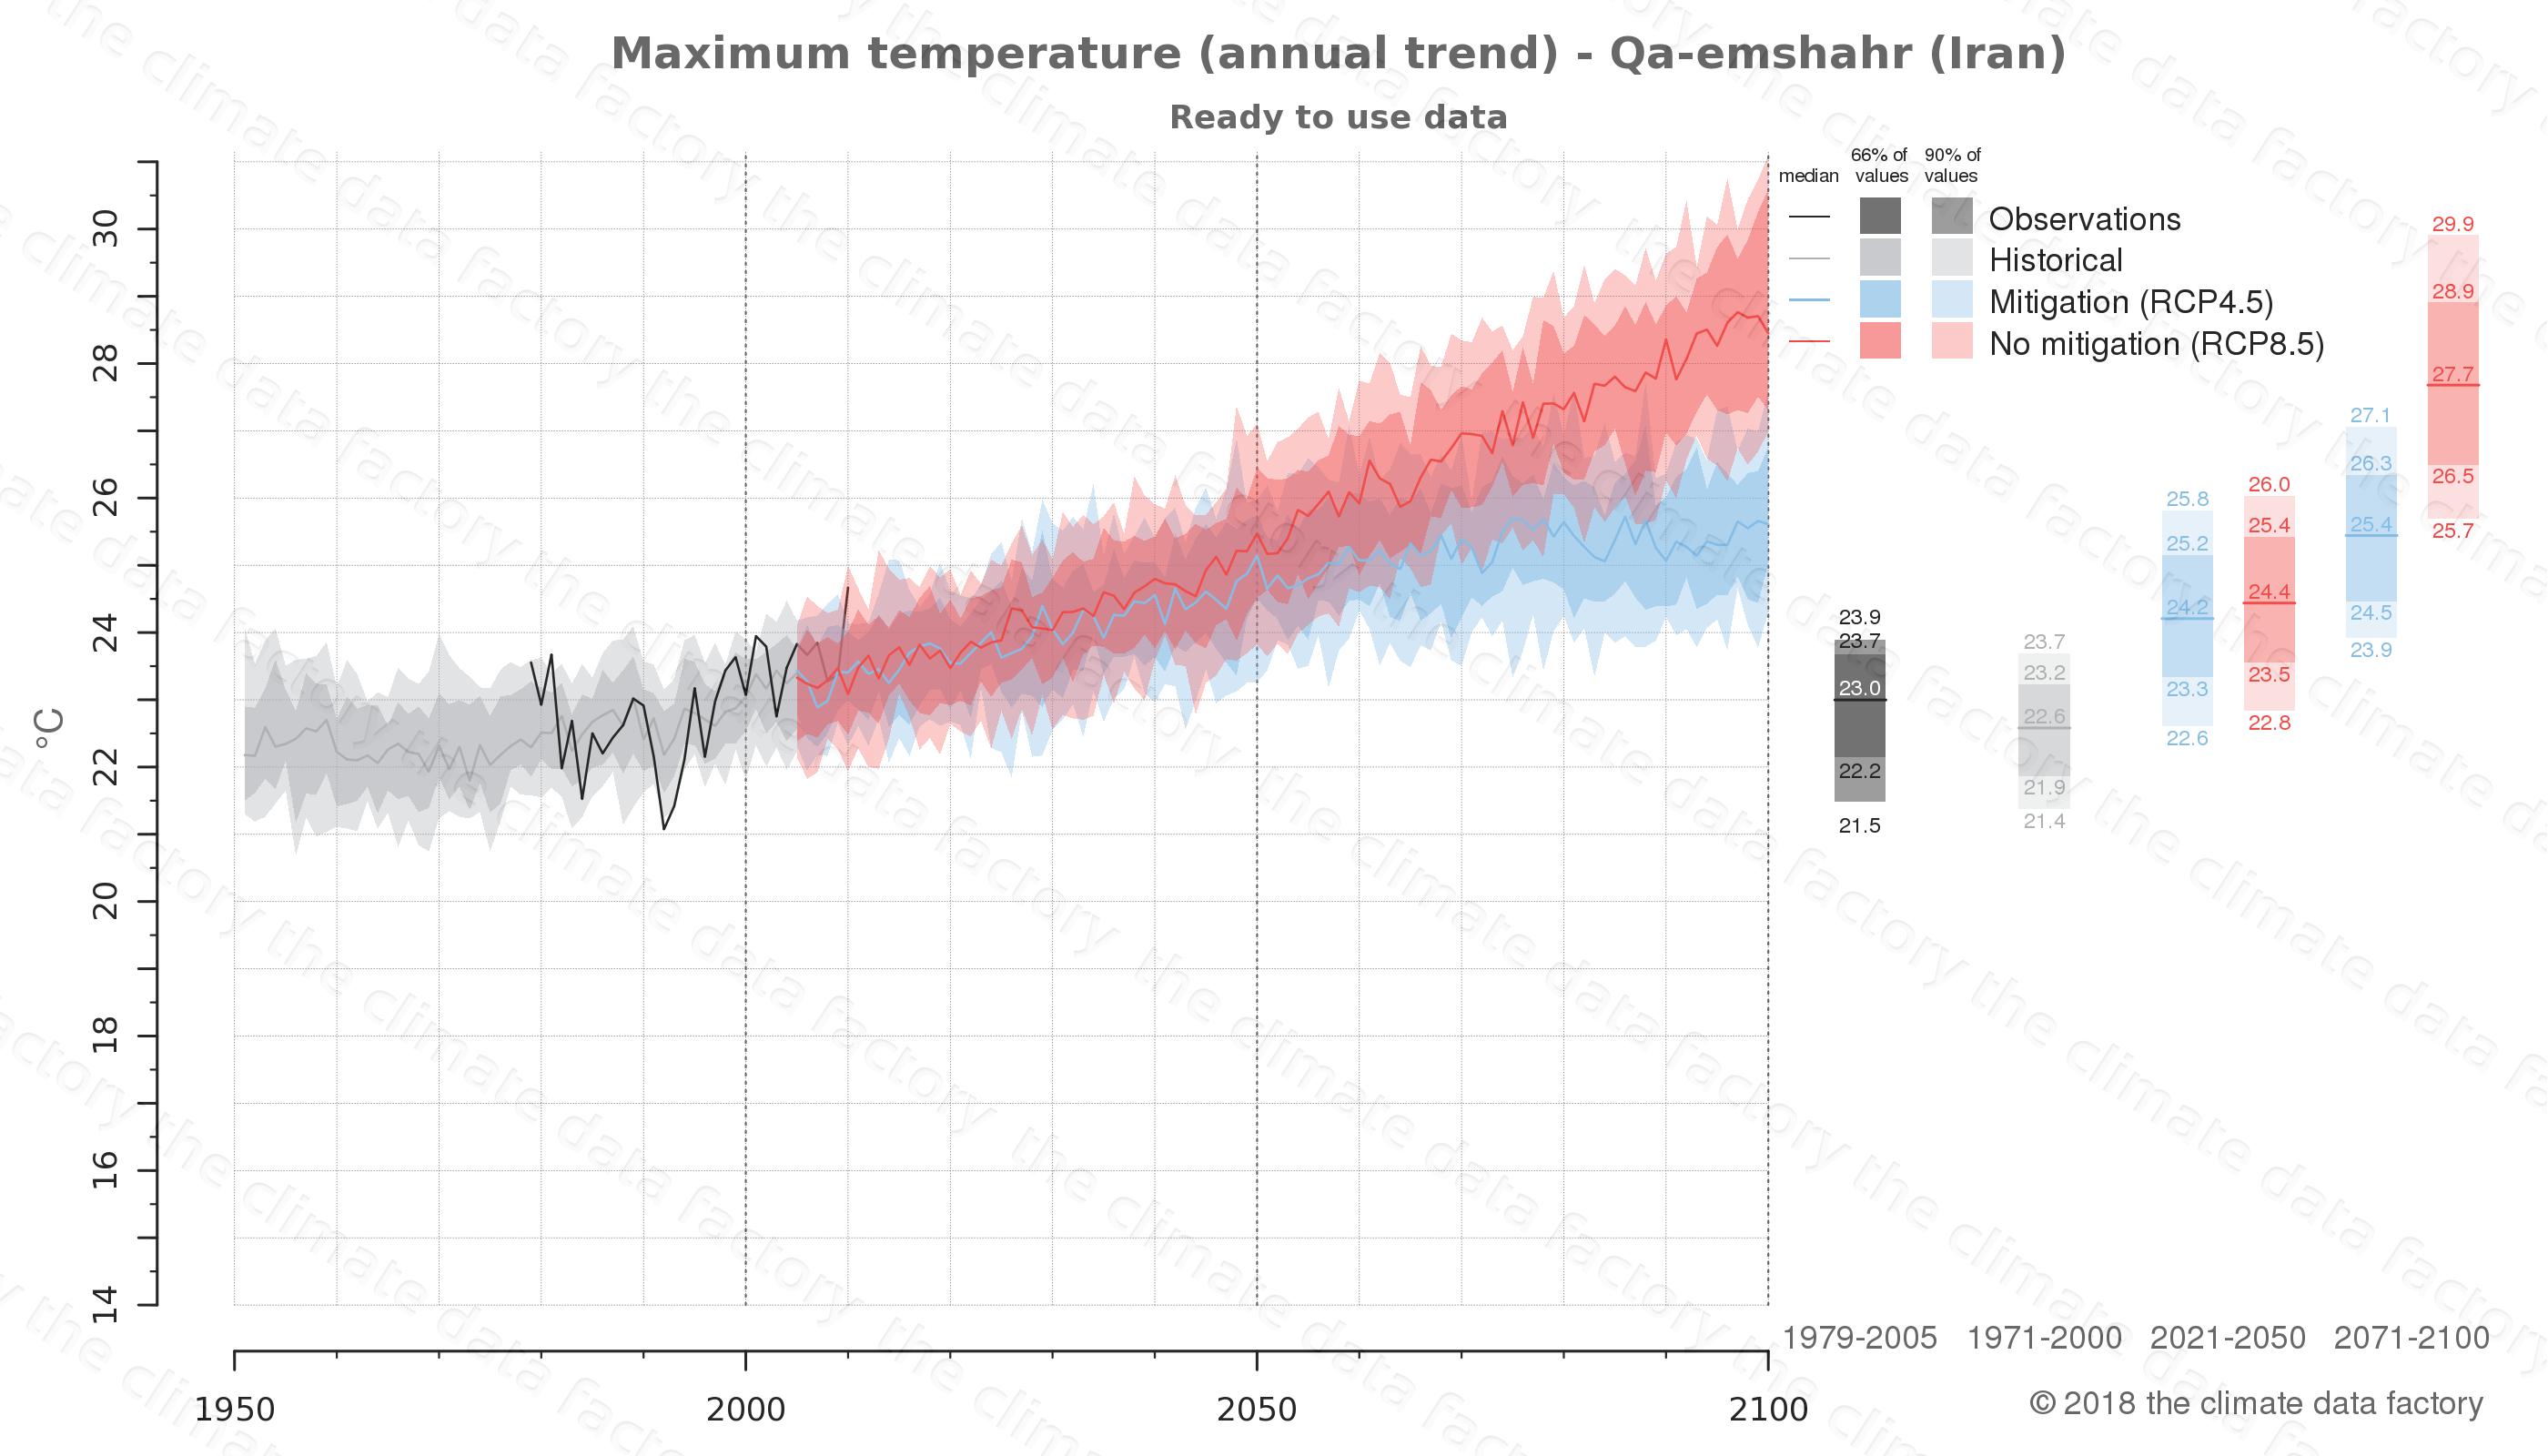 climate change data policy adaptation climate graph city data maximum-temperature qa-emshahr iran